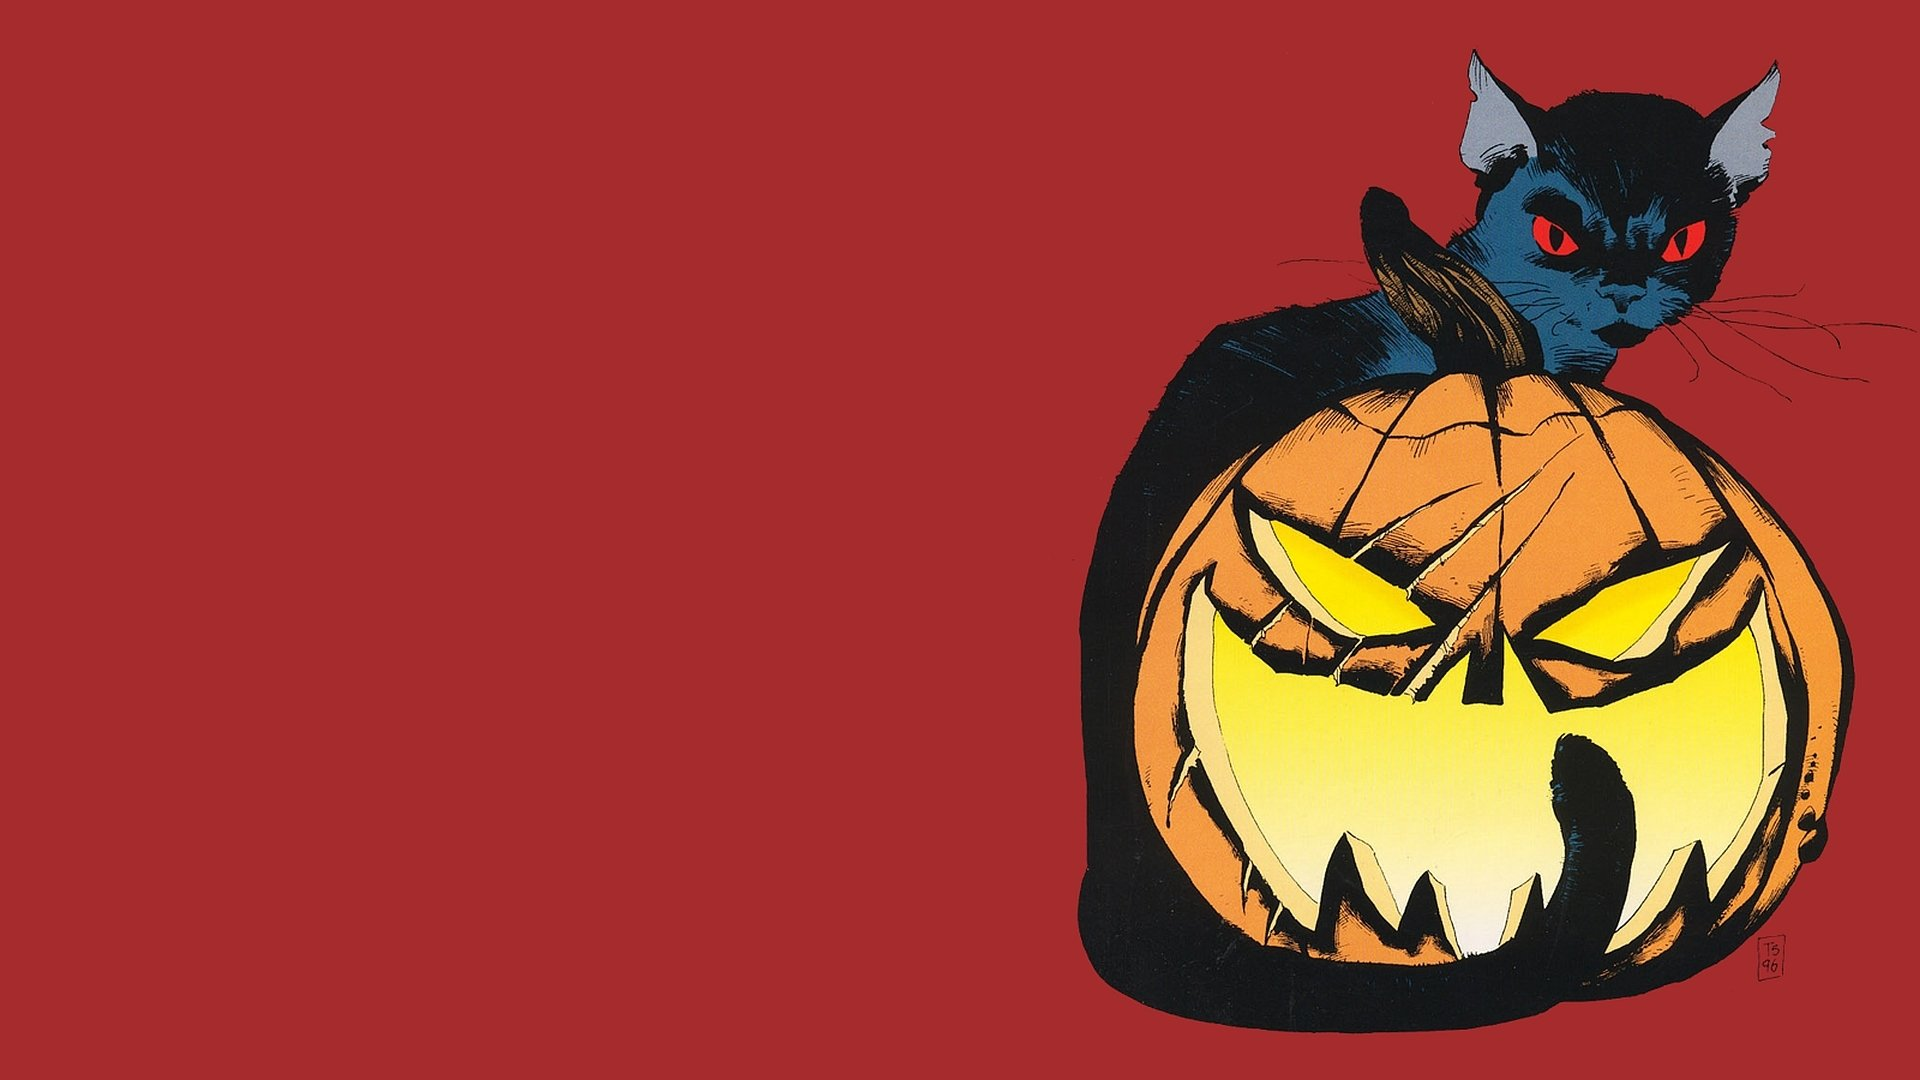 Must see Wallpaper Halloween Batman - thumb-1920-567799  Photograph_719624.jpg